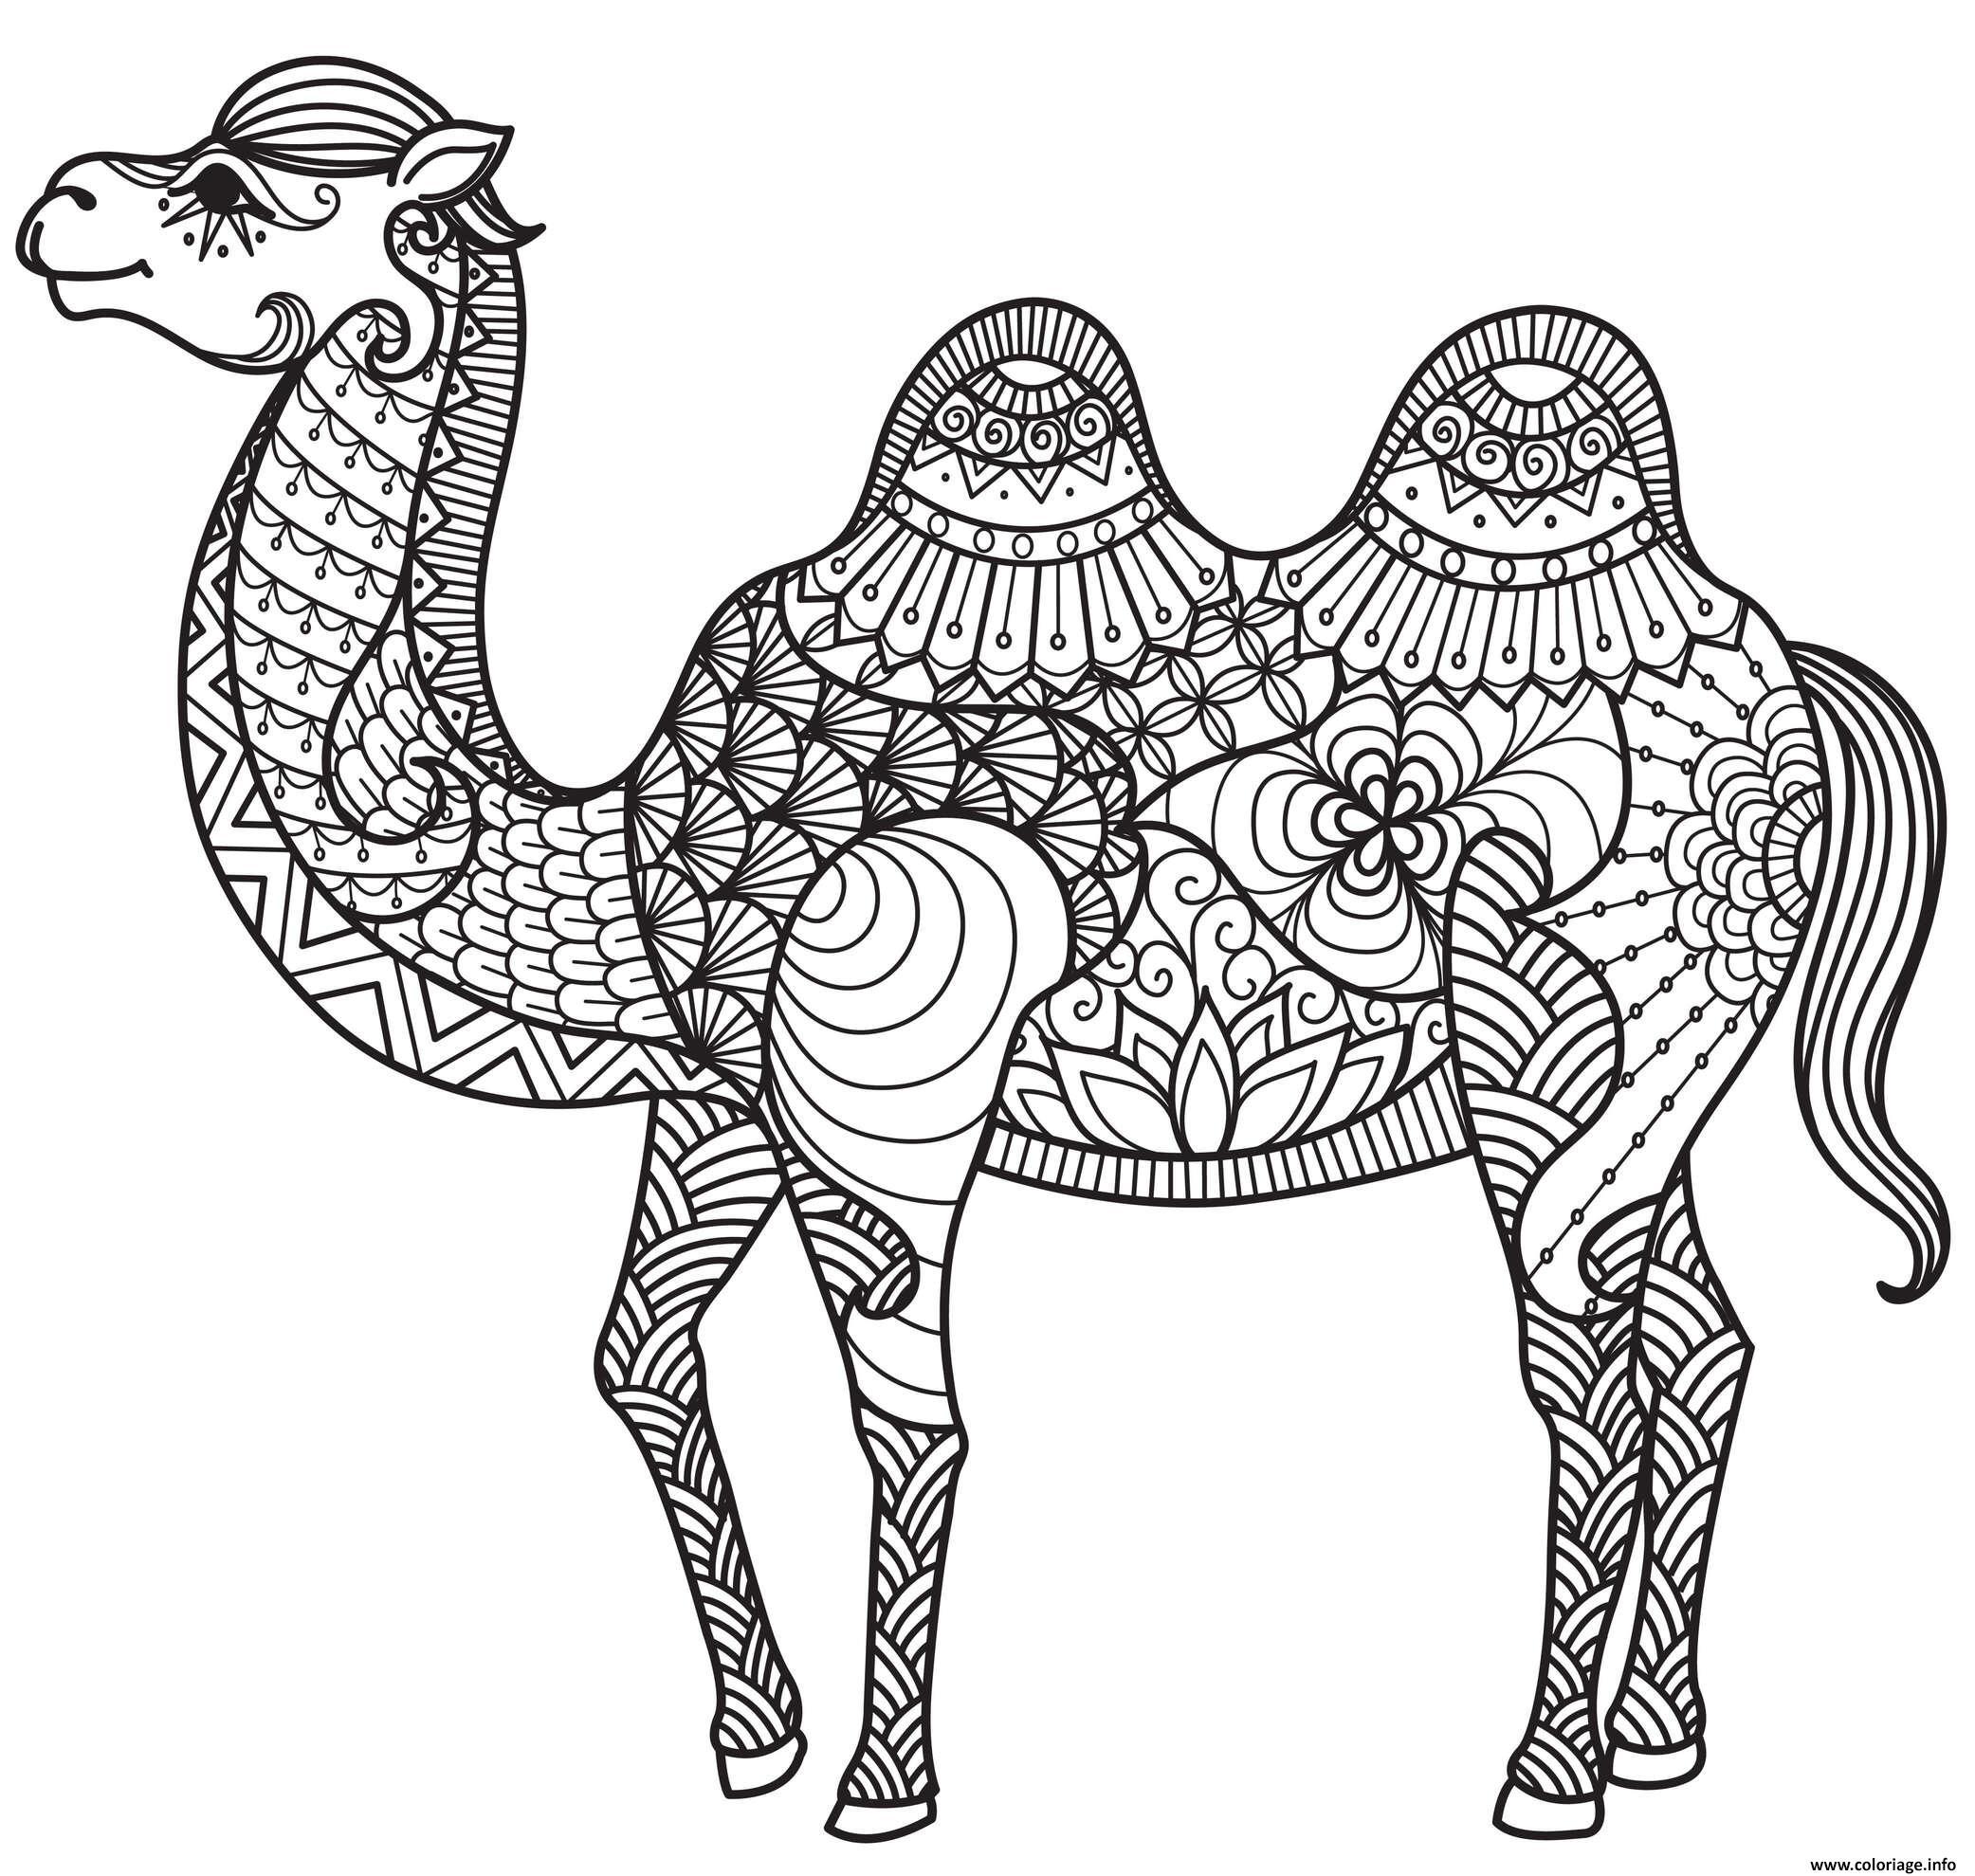 Coloriage chameau adulte animaux anti-stress - JeColorie.com